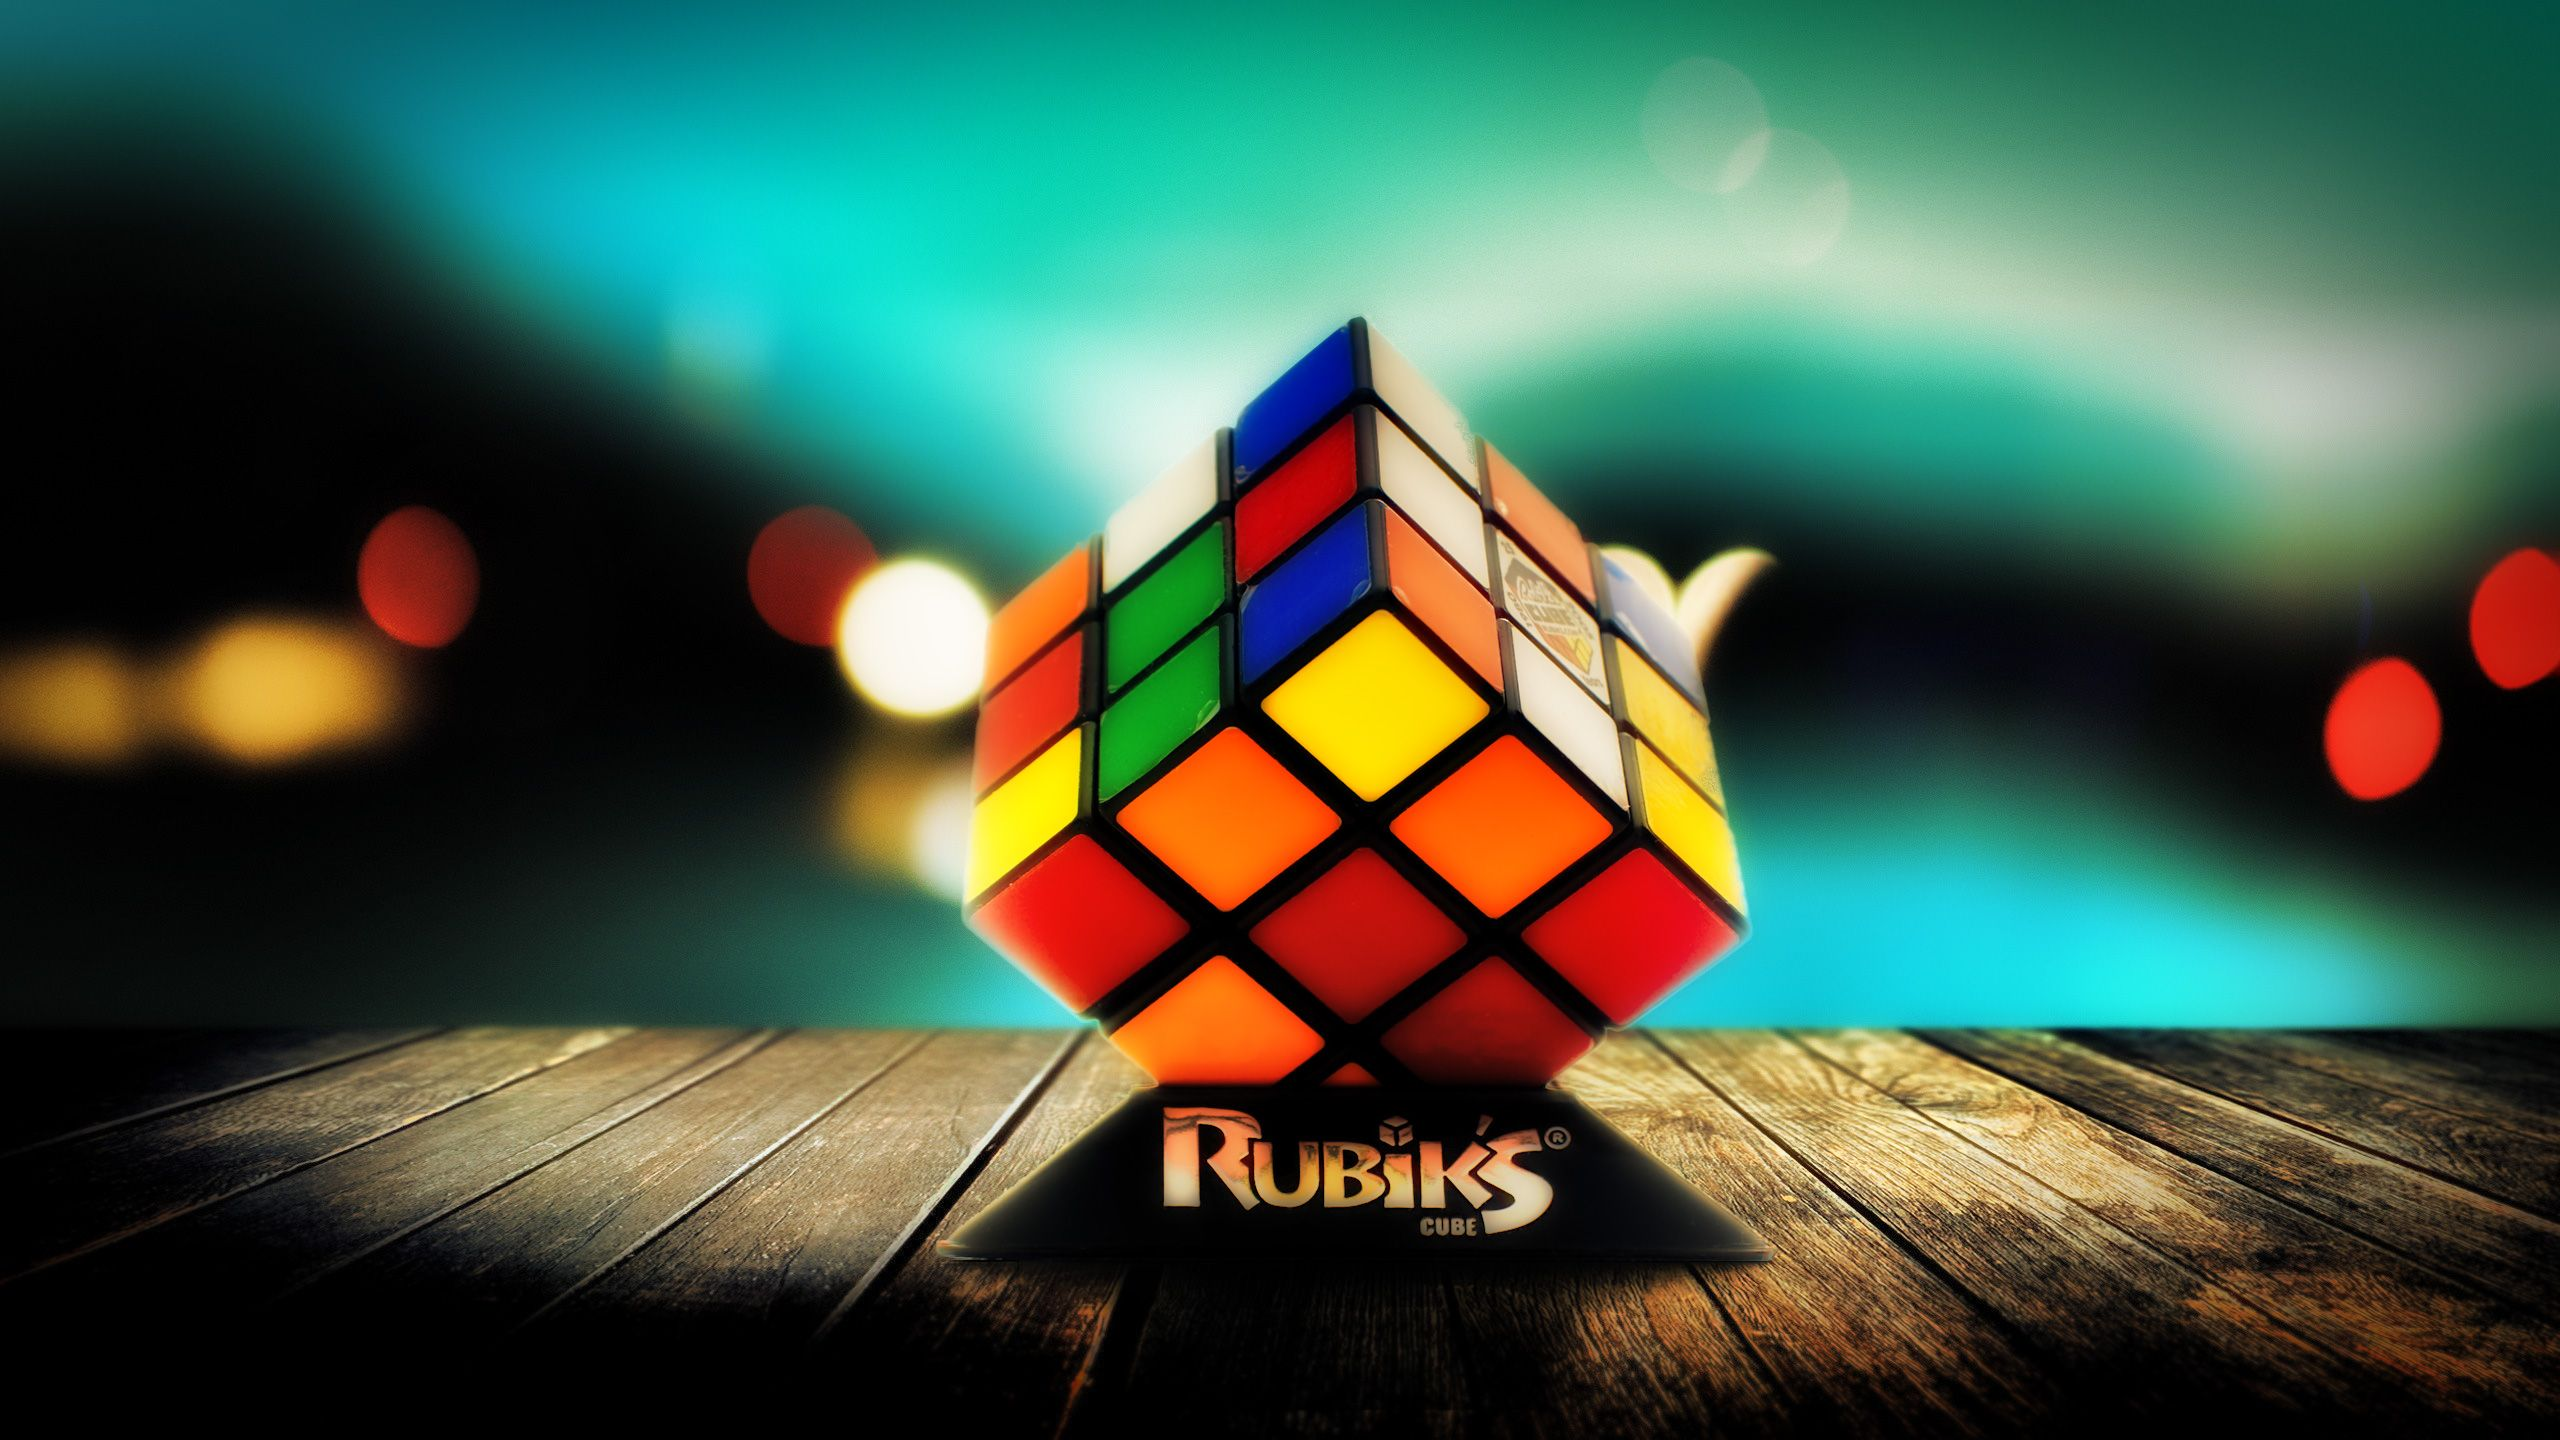 cube computer wallpapers desktop - photo #30